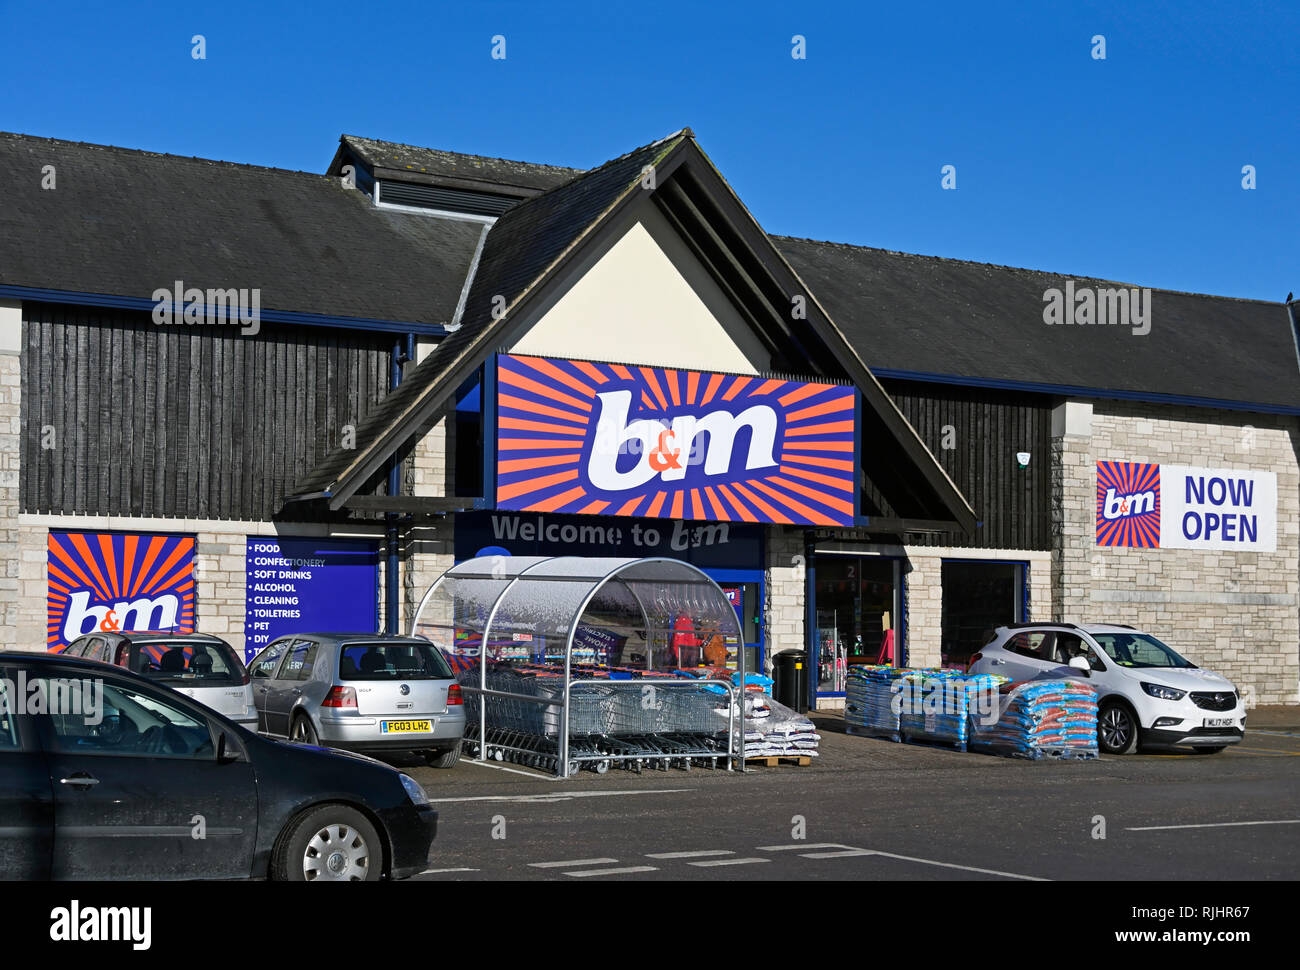 B & M Store. The Old Showground, Kendal, Cumbria, England, United Kingdom, Europe. - Stock Image